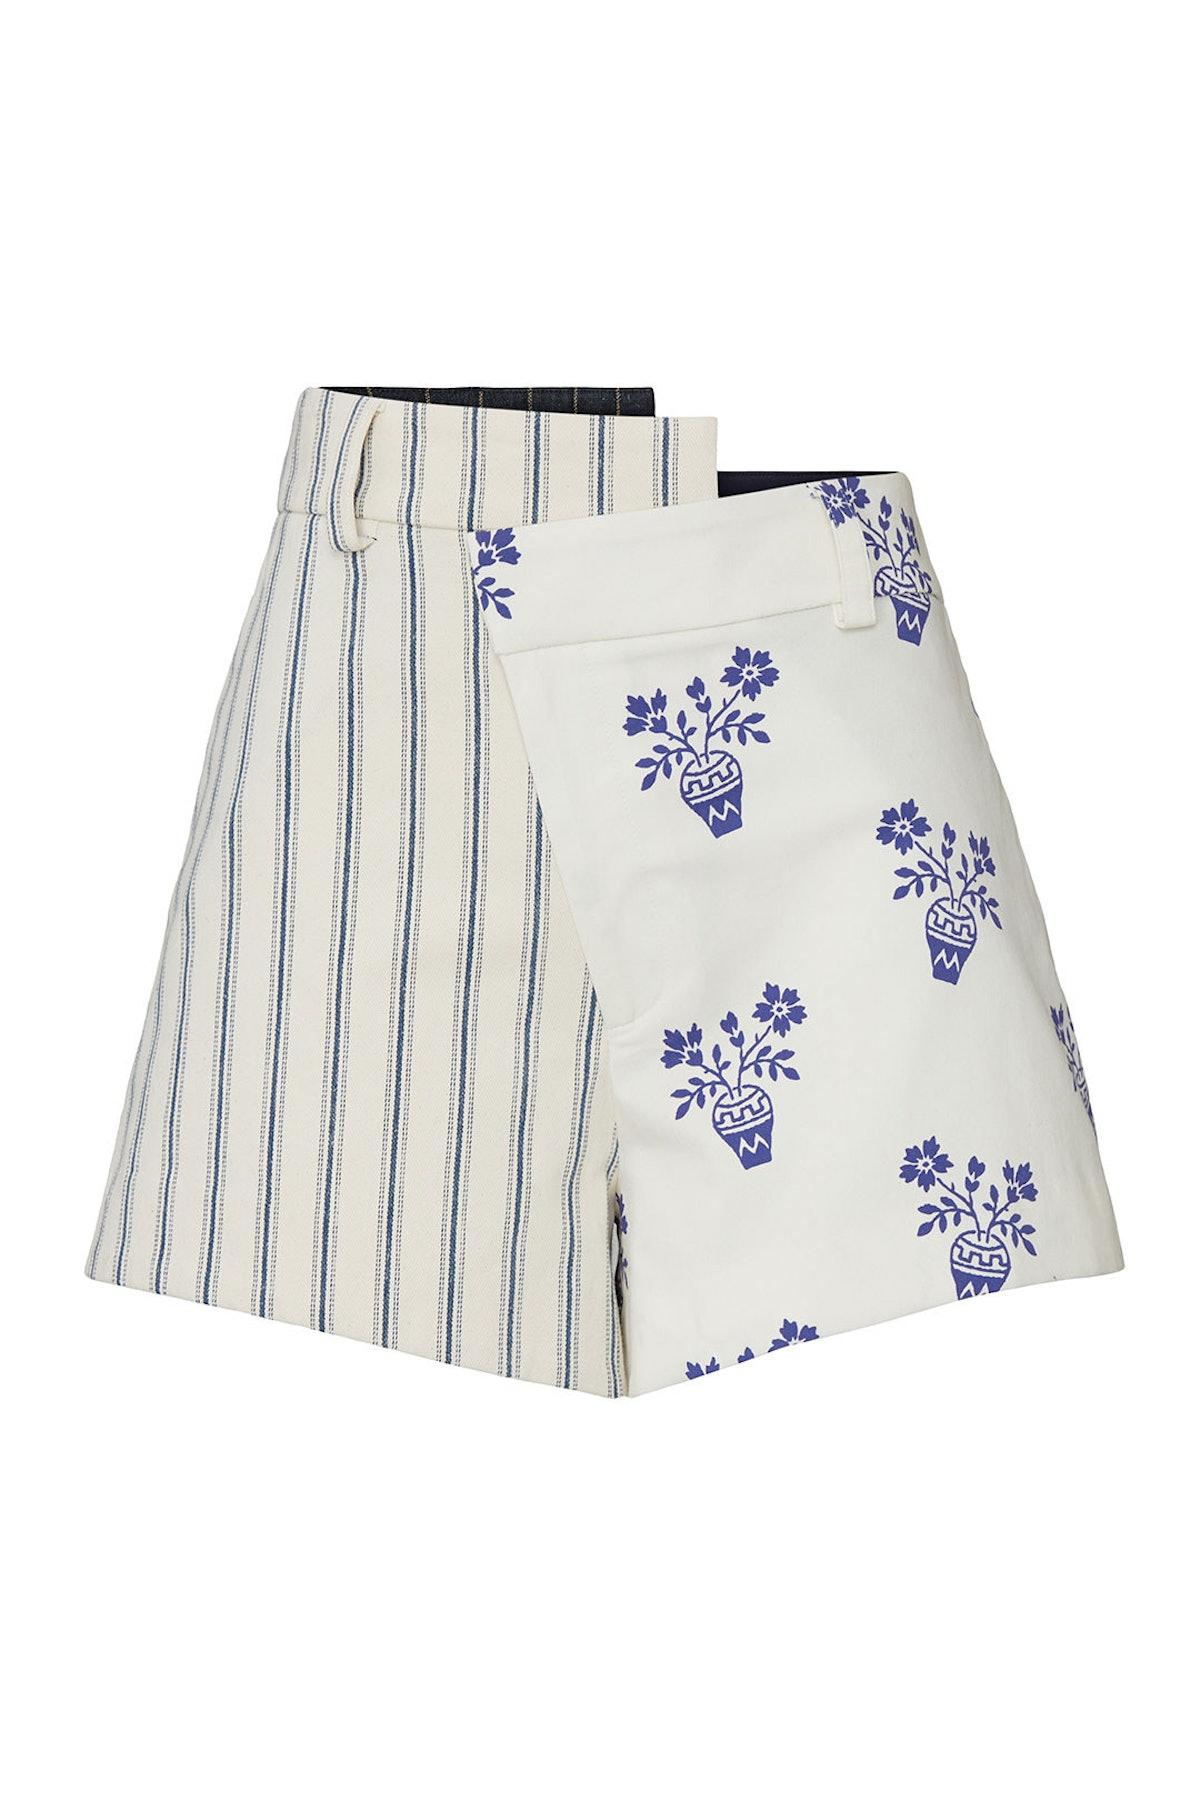 Flower Pot Striped Shorts